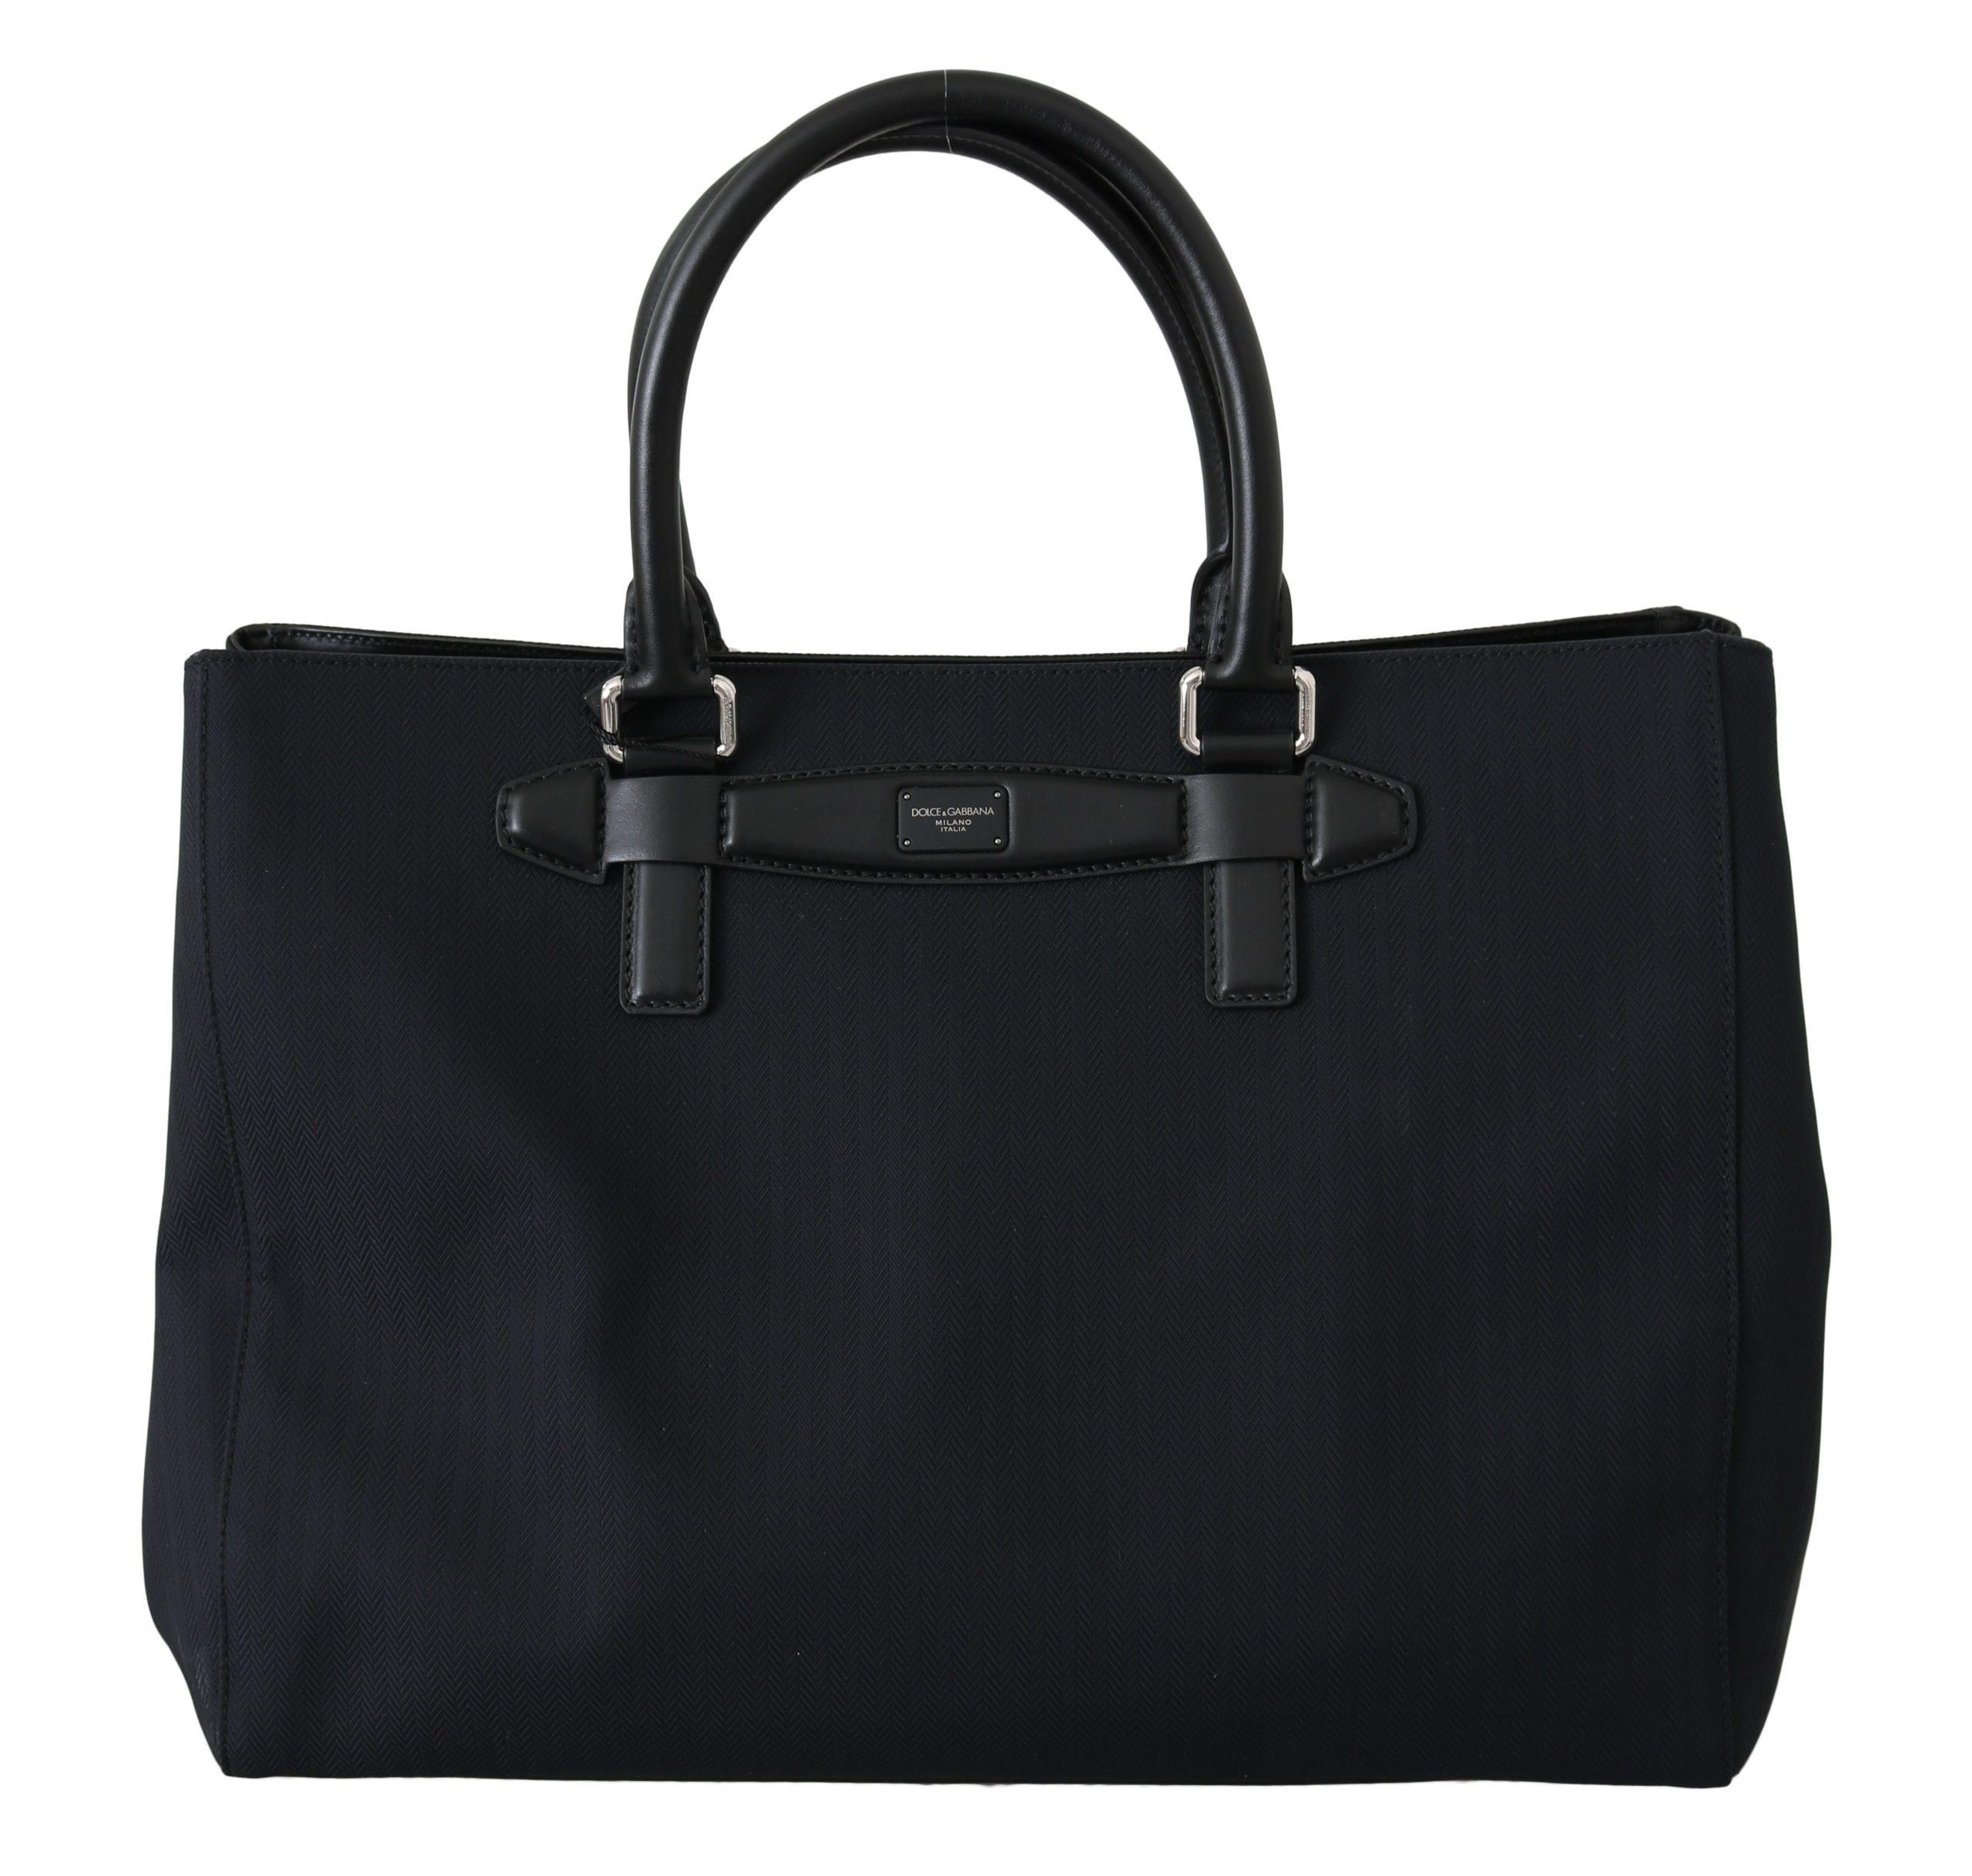 Black Handbag Shopping Tote Borse Travel Nylon Bag